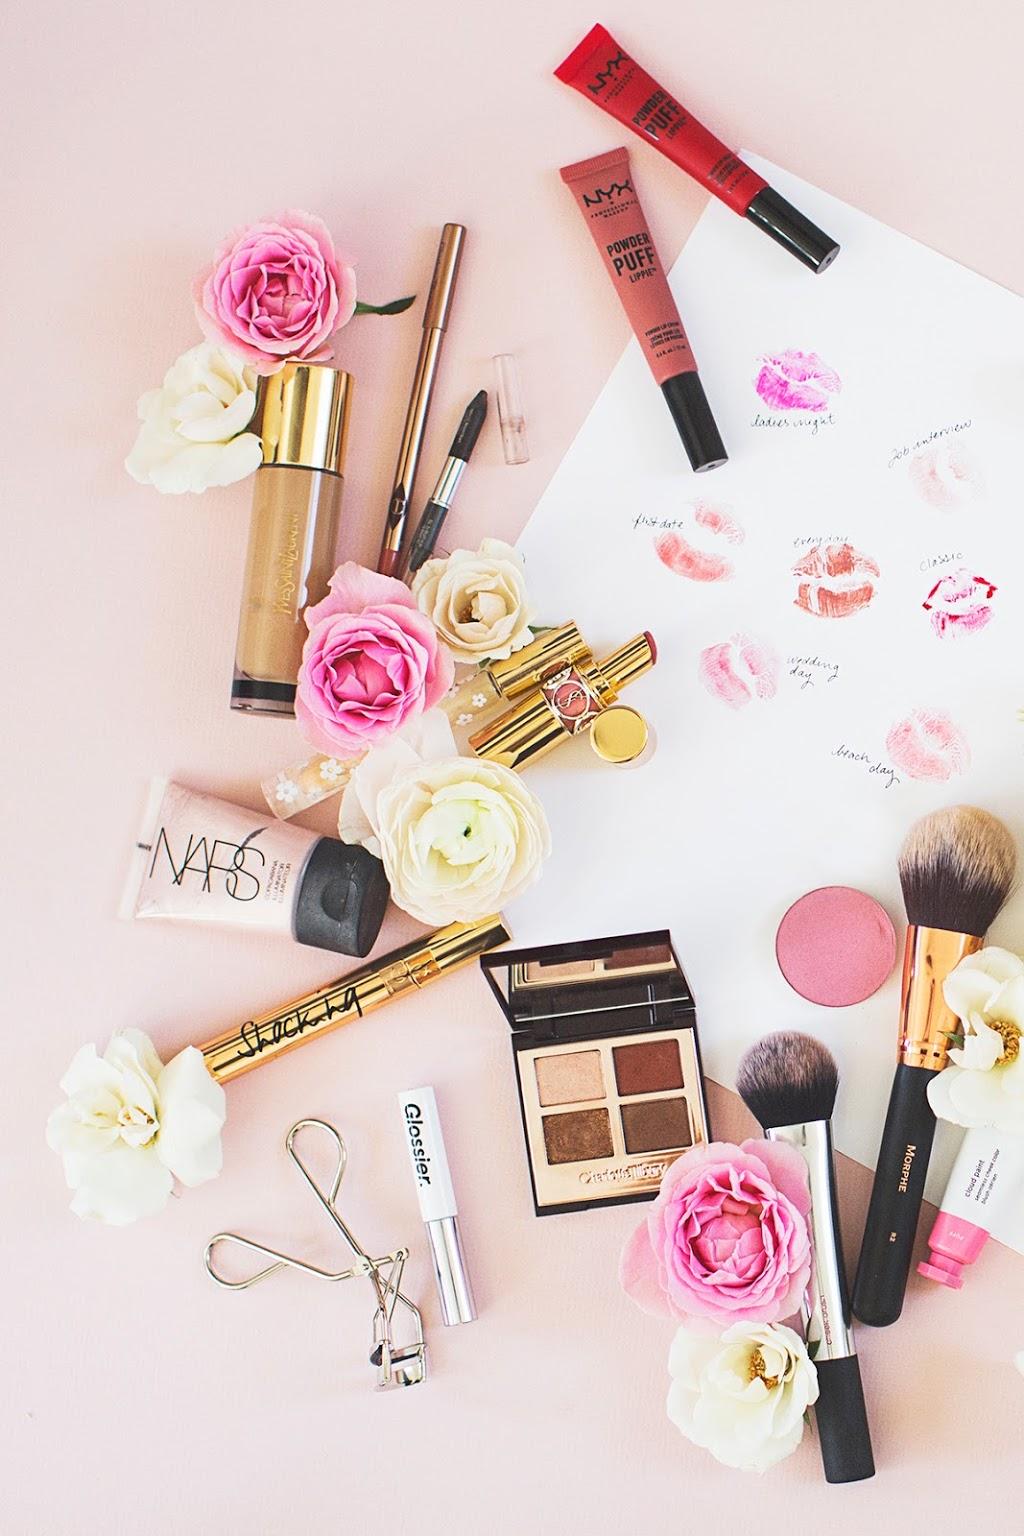 Myuz Makeup Artistry and Esthetics | spa | 534 Waterloo St, Winnipeg, MB R3N 0T1, Canada | 2049518020 OR +1 204-951-8020